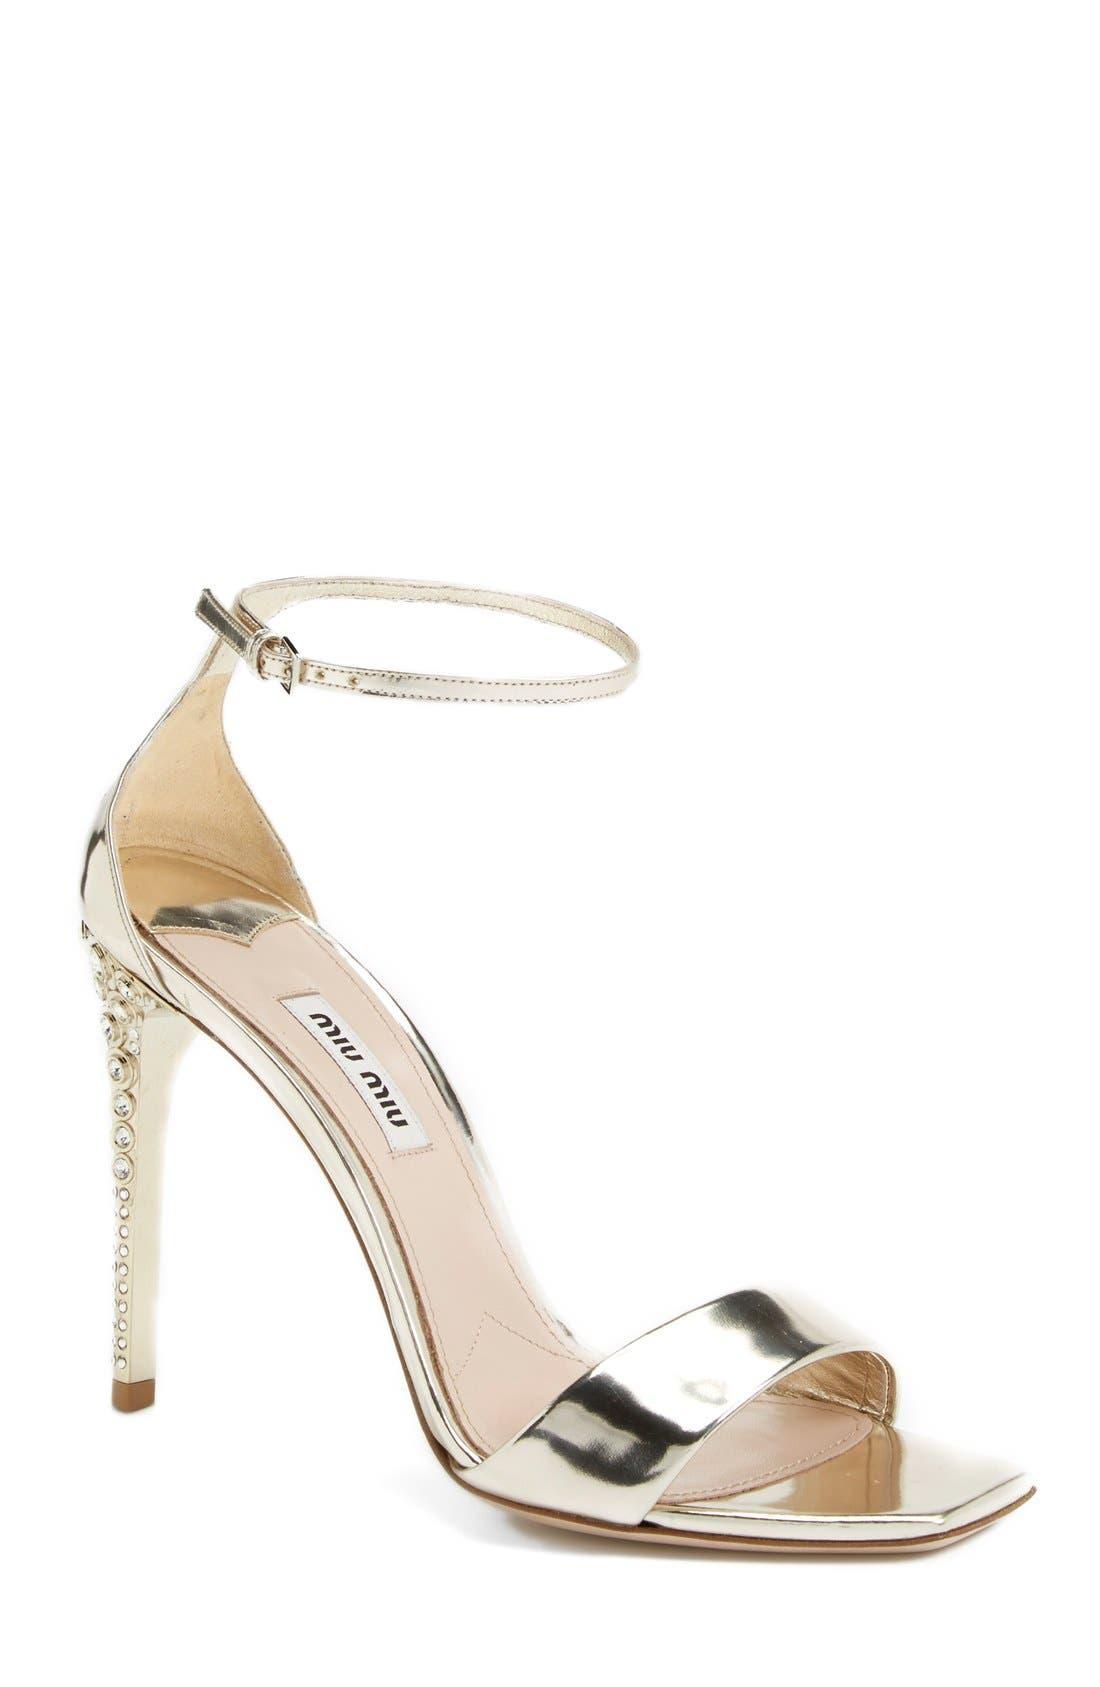 Alternate Image 1 Selected - Miu Miu Metallic Ankle Strap Sandal (Women)